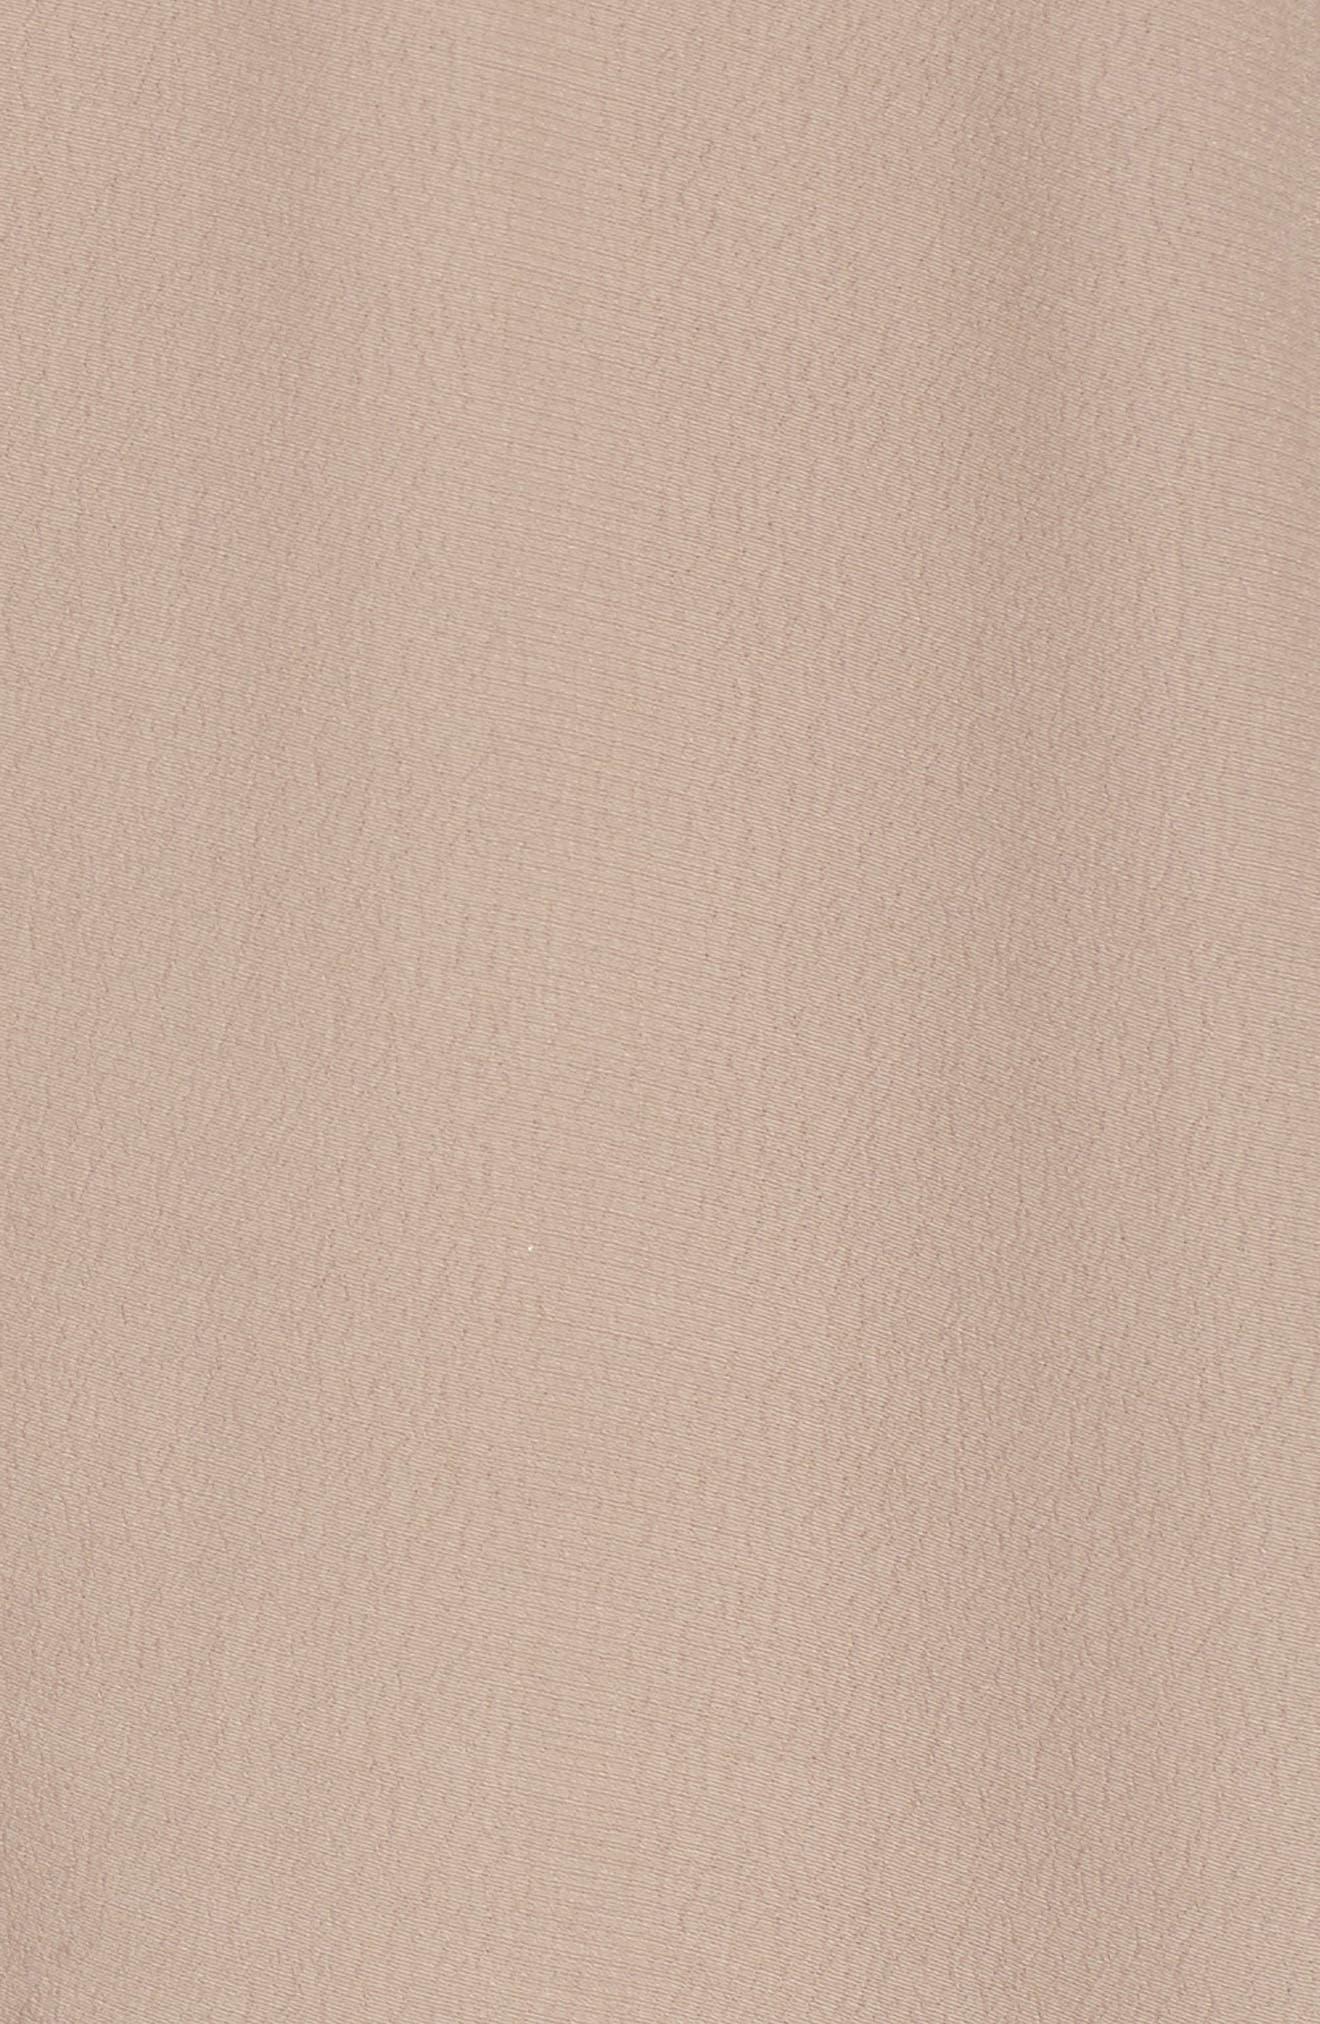 Fern Fit & Flare Dress,                             Alternate thumbnail 5, color,                             Faded Mauve